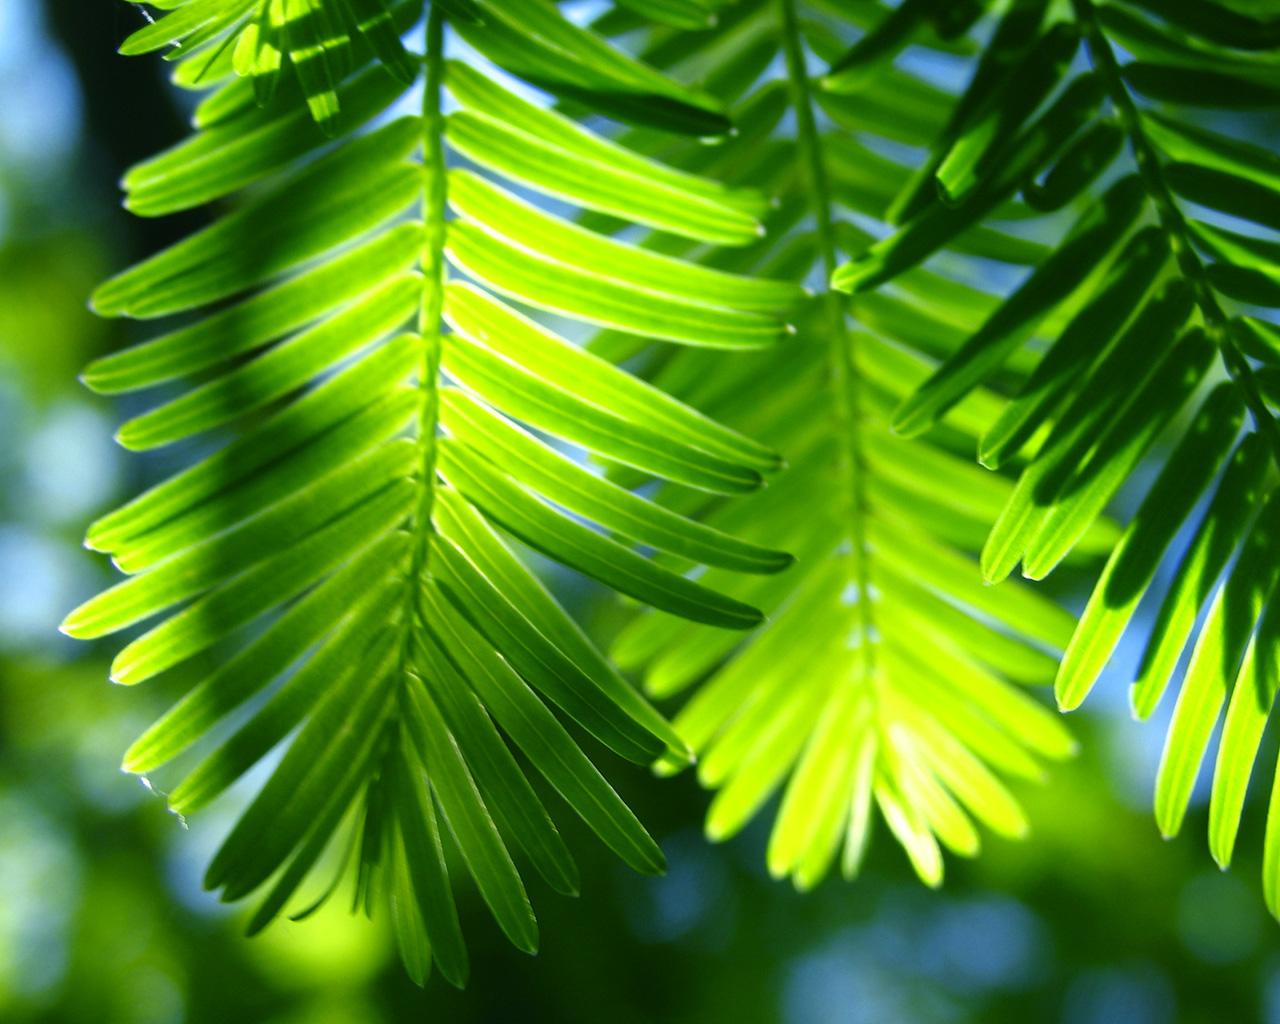 WALLPAPER GREEN LEAVES TROPICAL PARADISE 05JPG HD Wallpaper HD 1280x1024